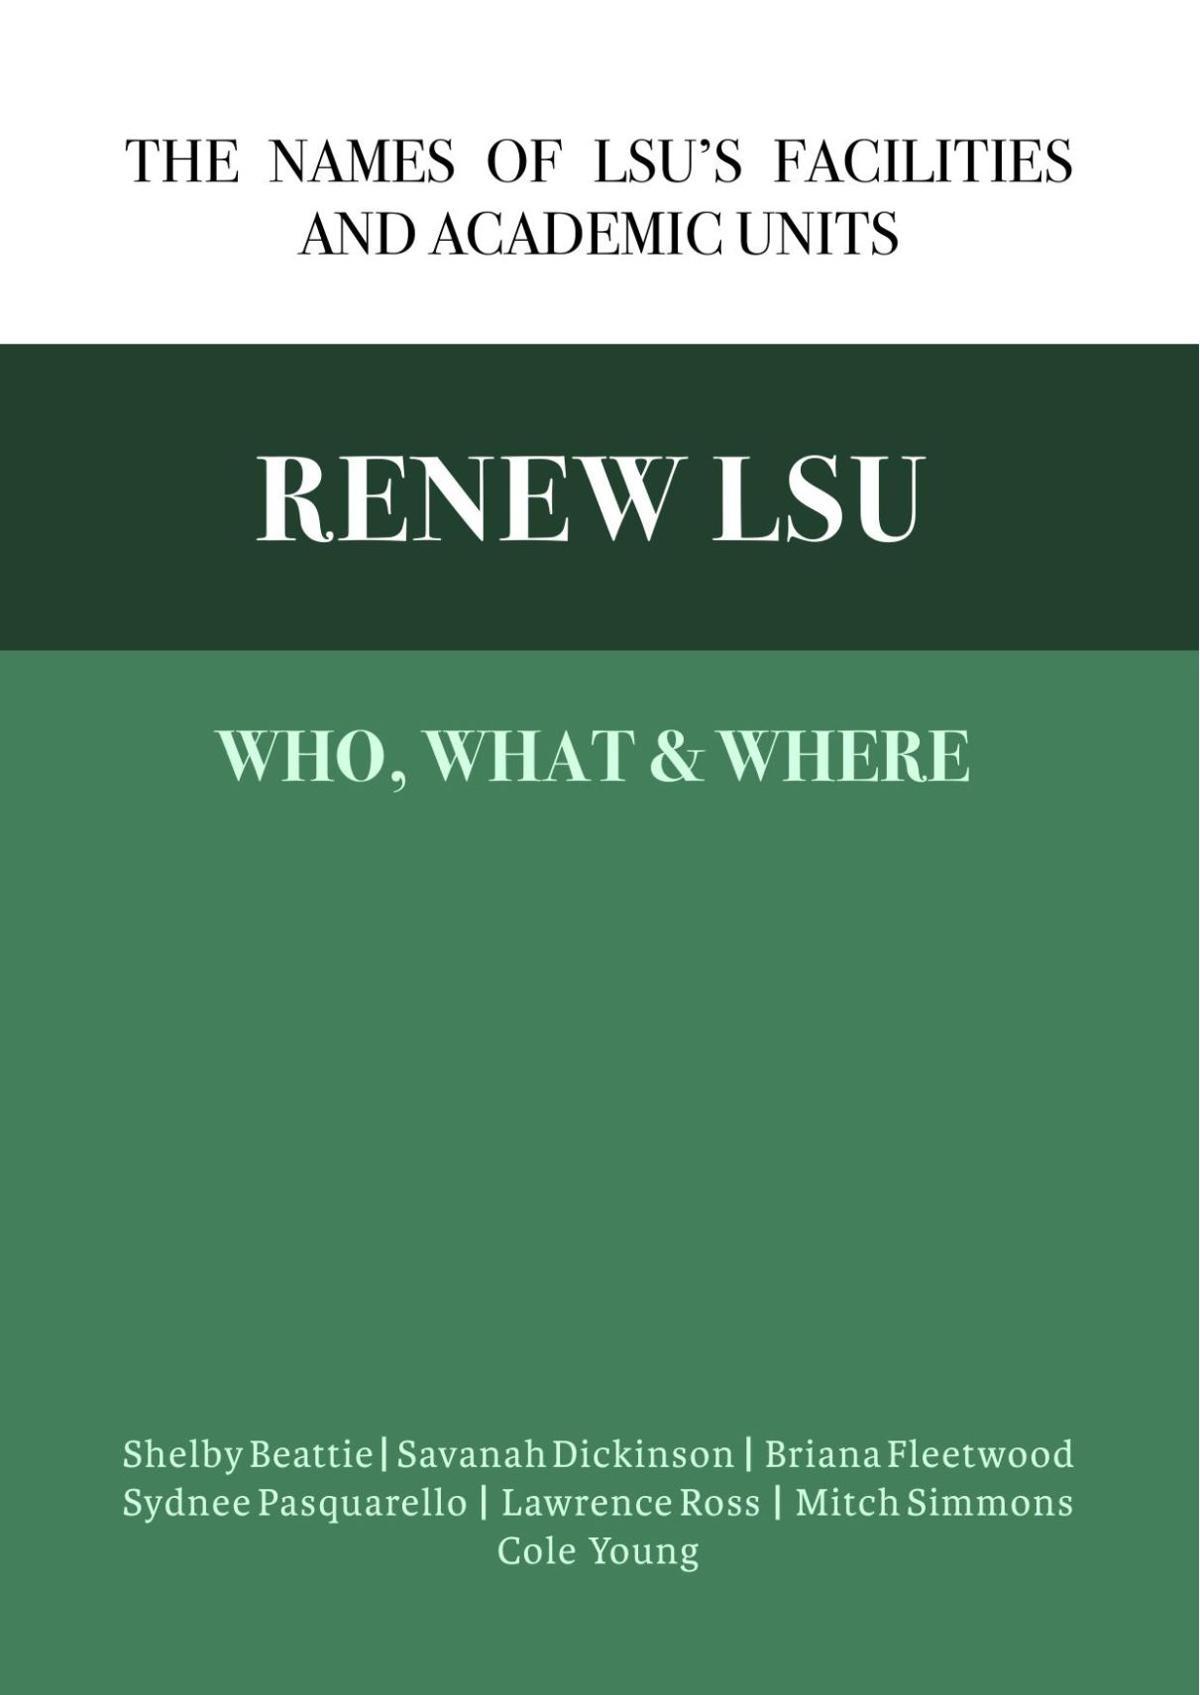 Renew LSU Research